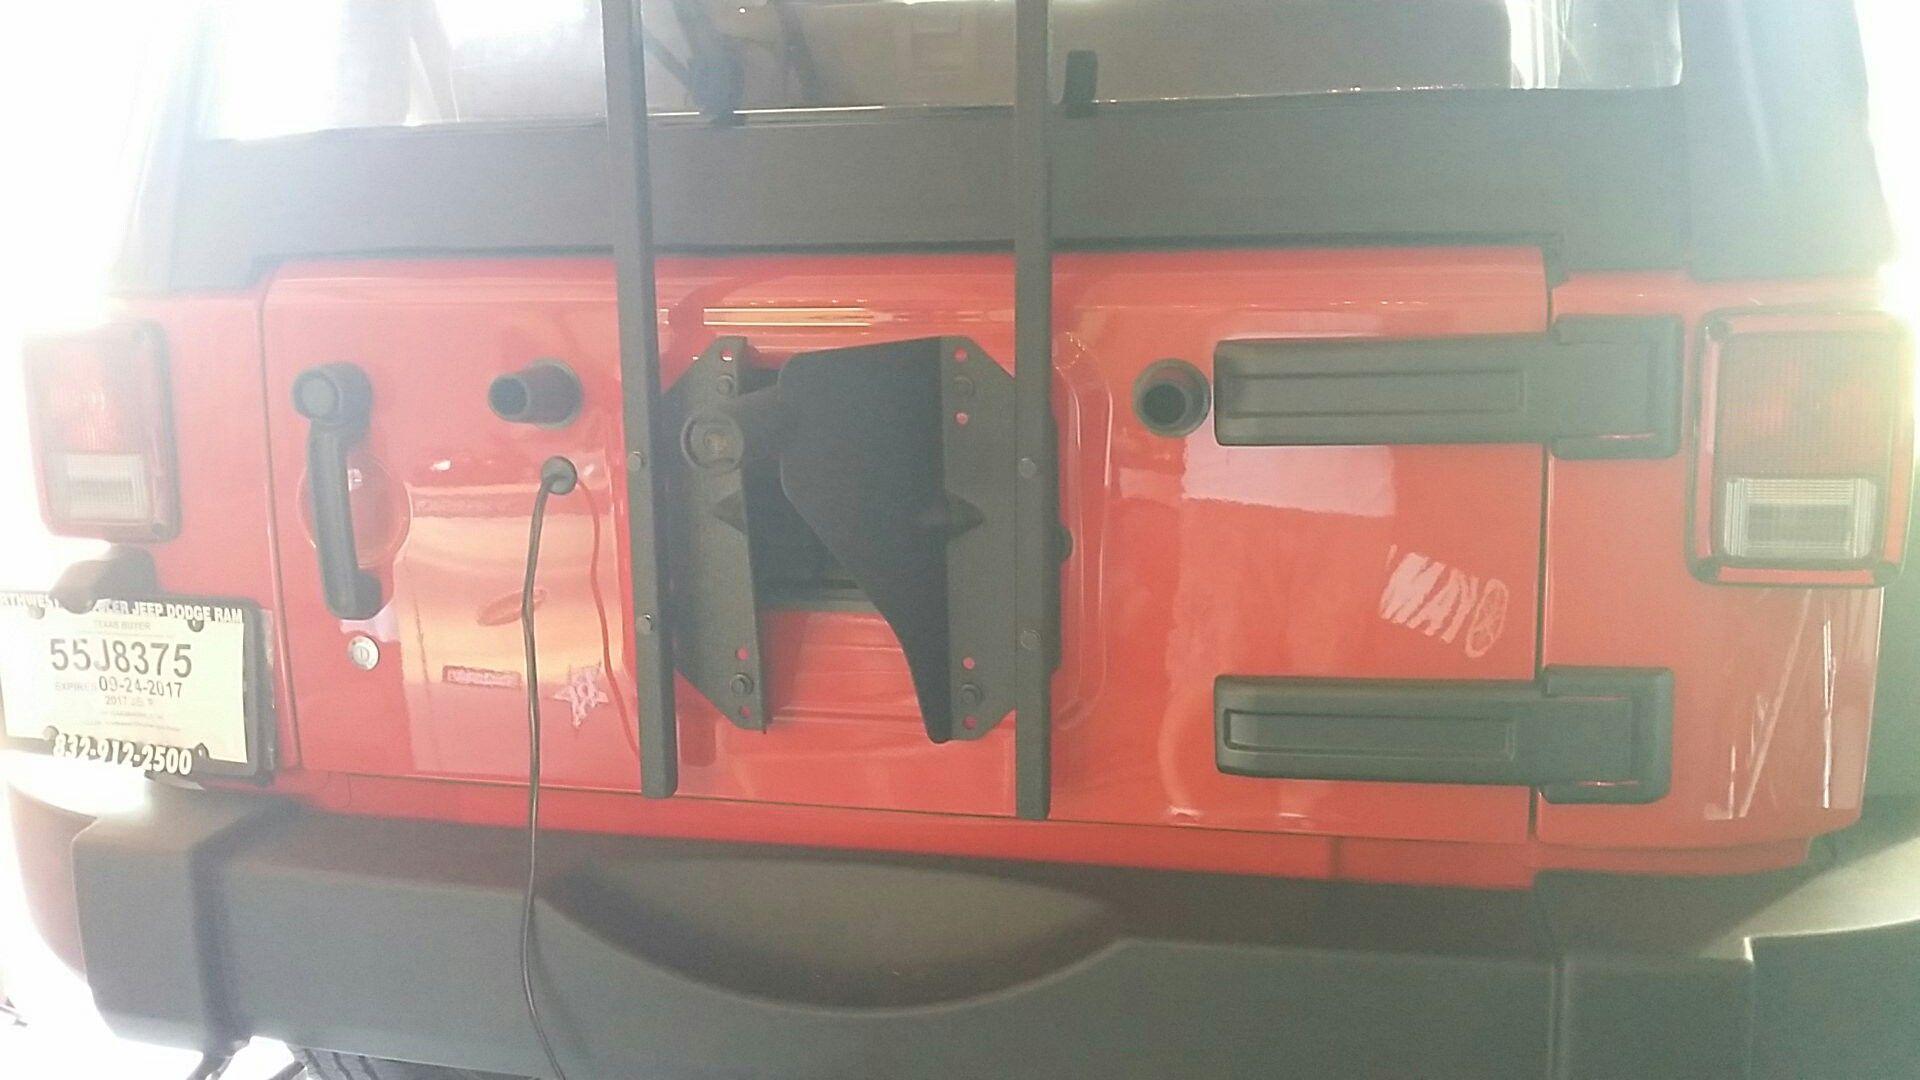 Oversize tire carrier 2017 jeep wrangler, Jeep wrangler